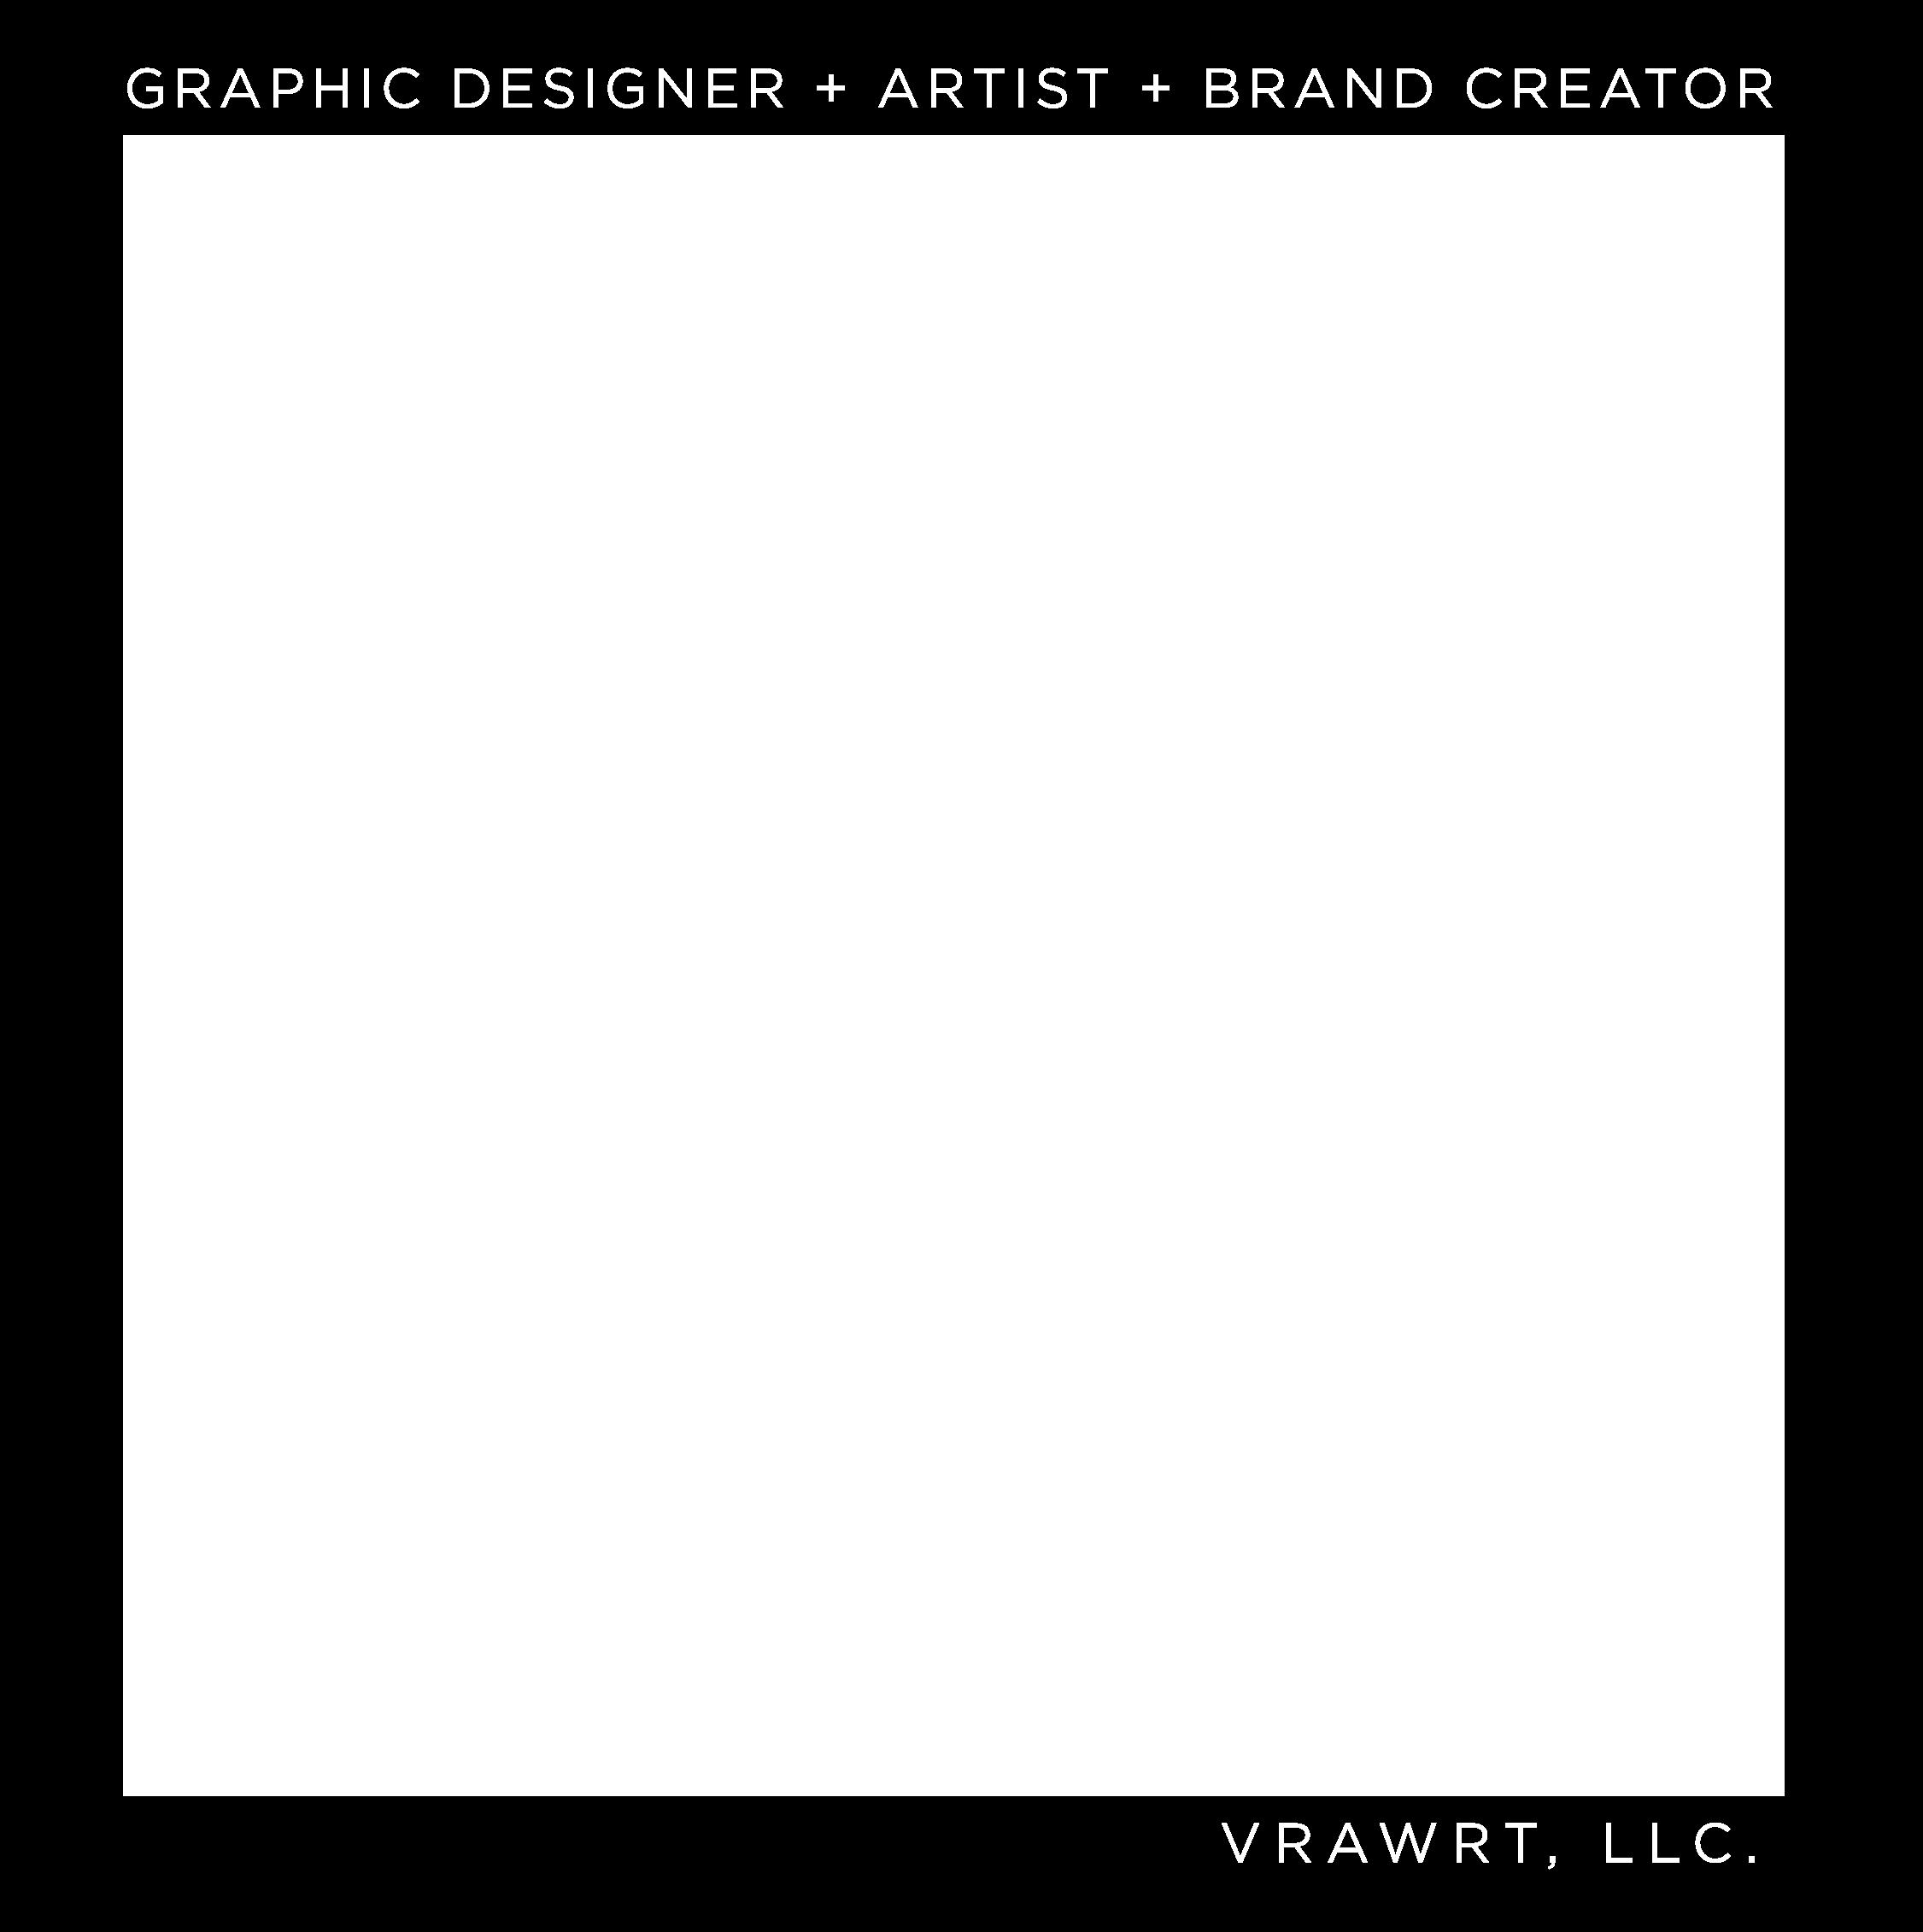 Logo__VRAWRT, LLC.png